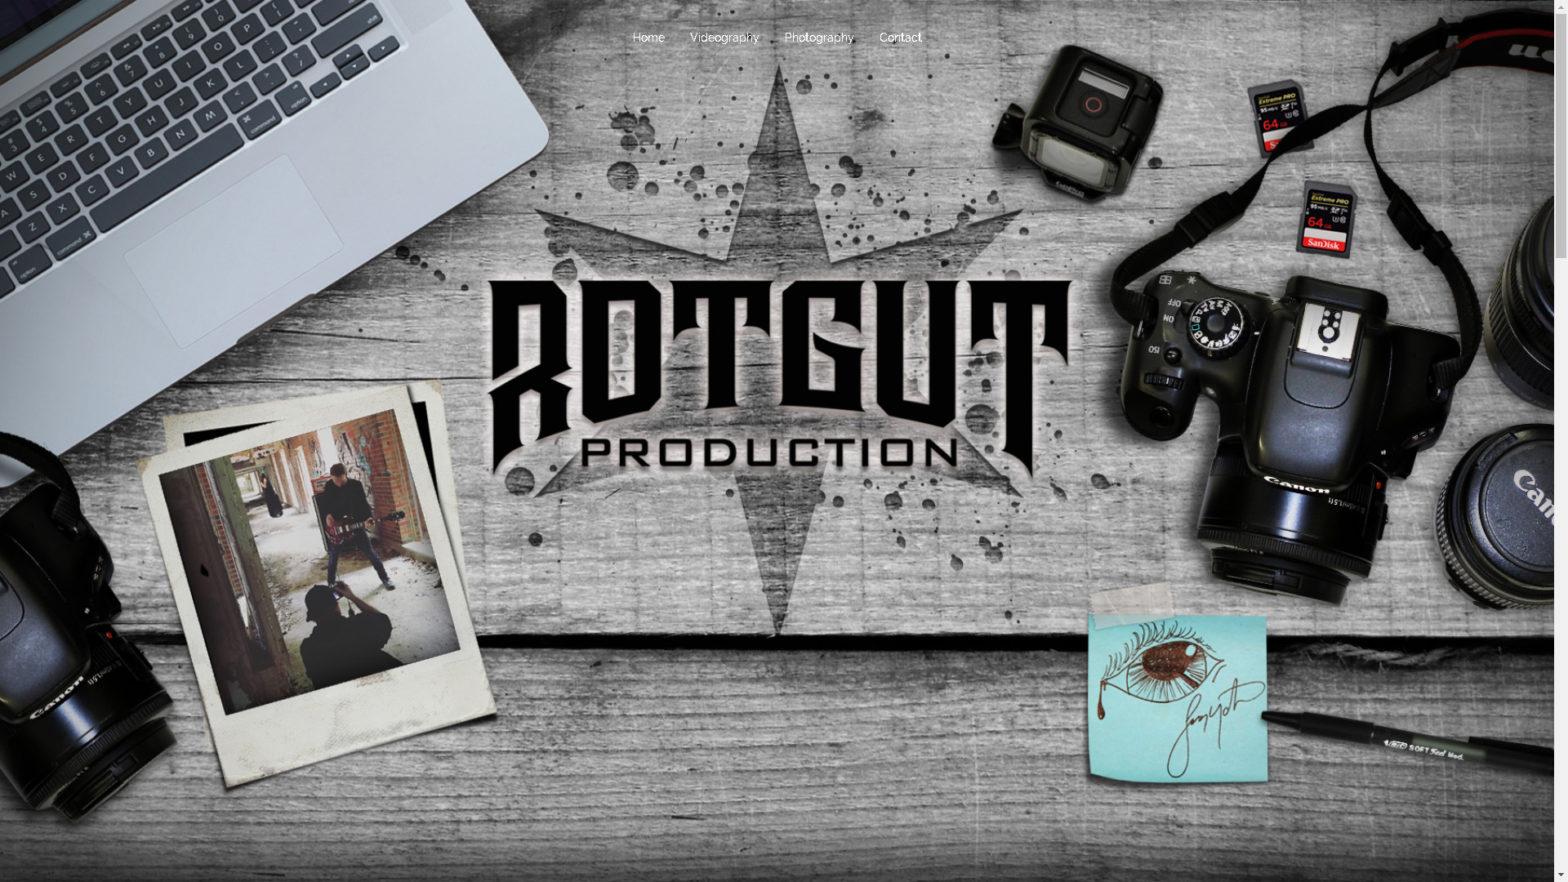 Rotgut Production